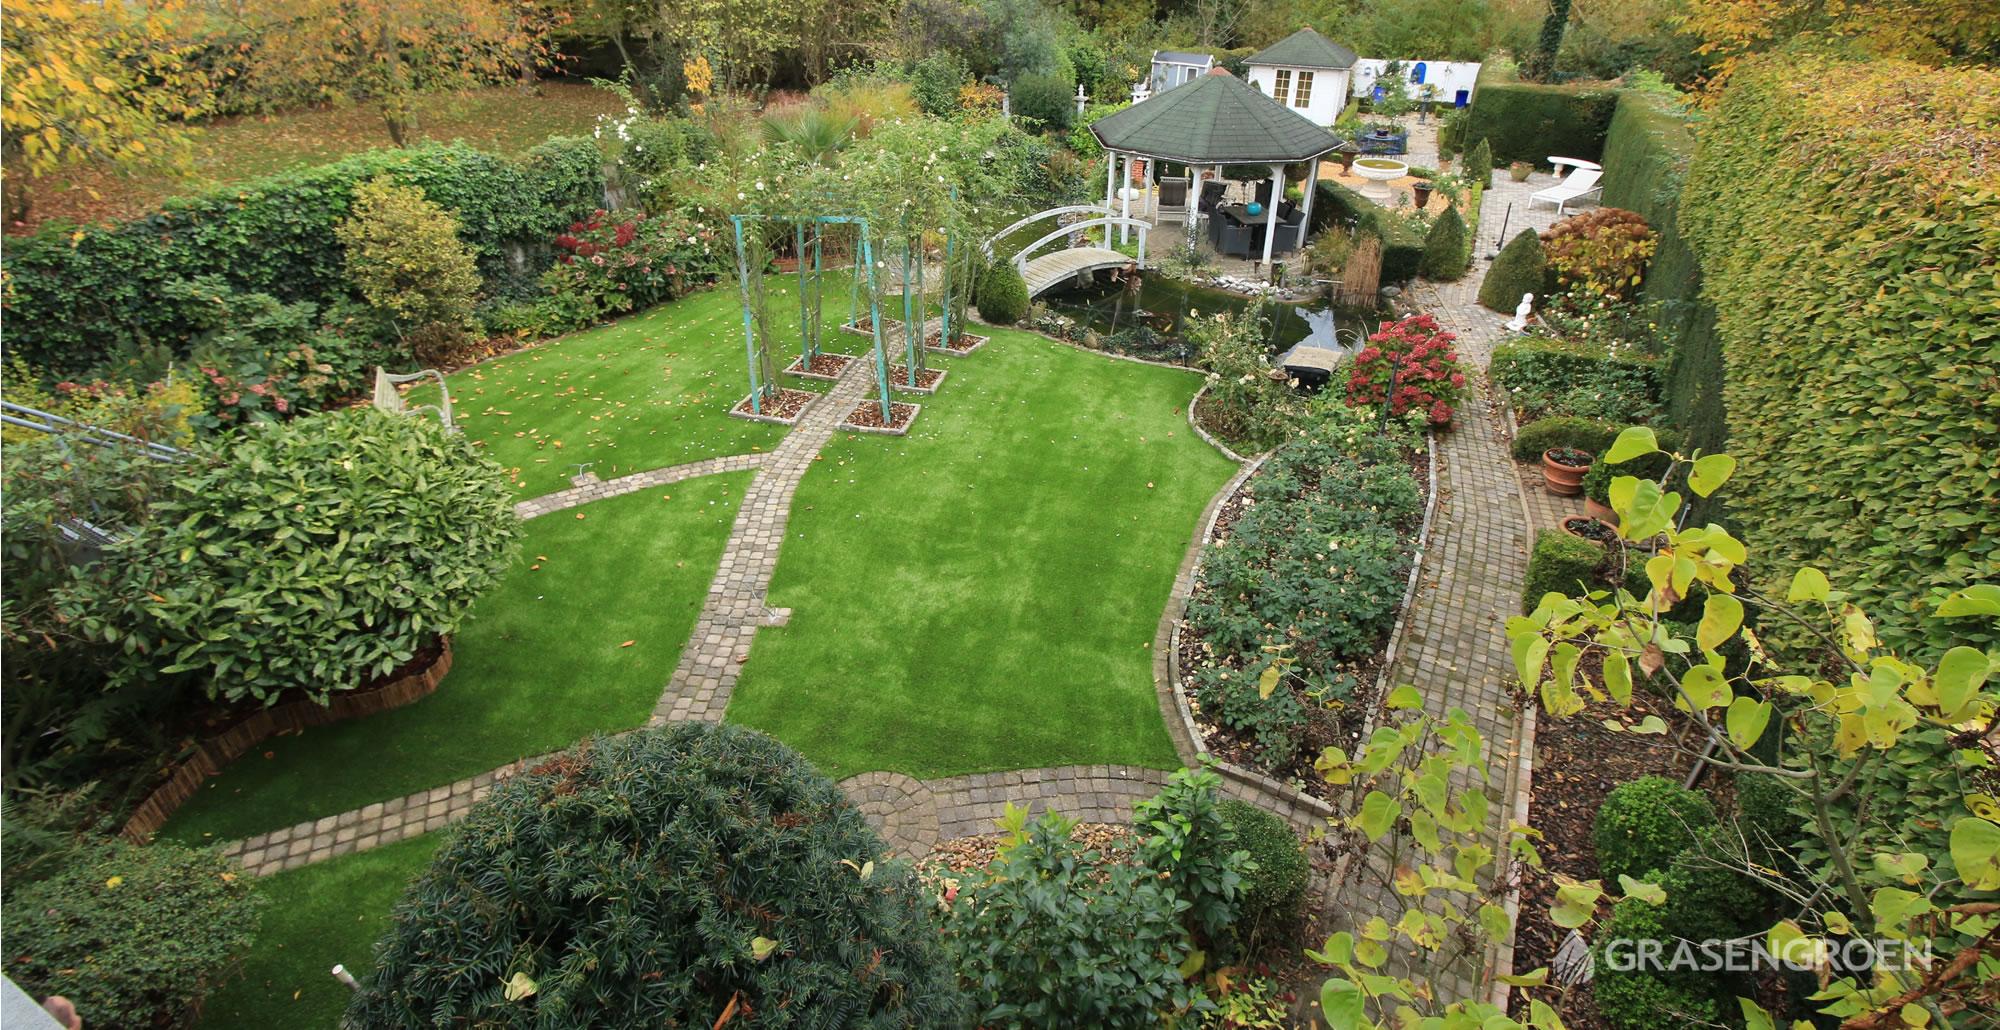 Kunstgrasleggensintjoriswinge18 • Gras en Groen Kunstgras